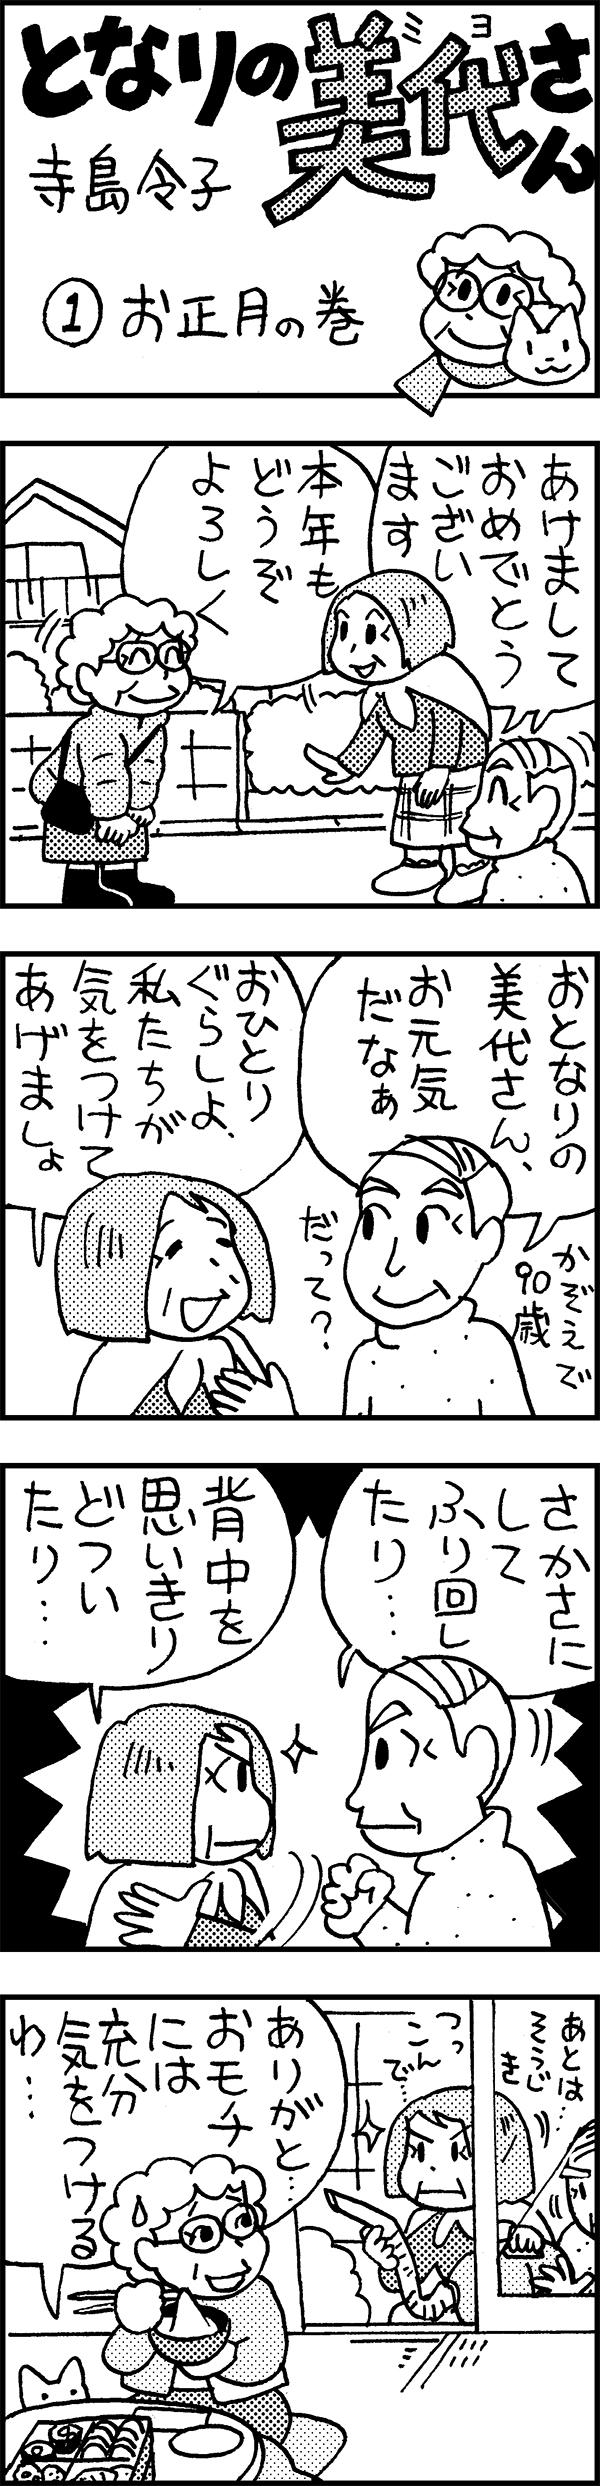 日本薬師堂会報誌掲載4コマ漫画 第1弾の画像1枚目